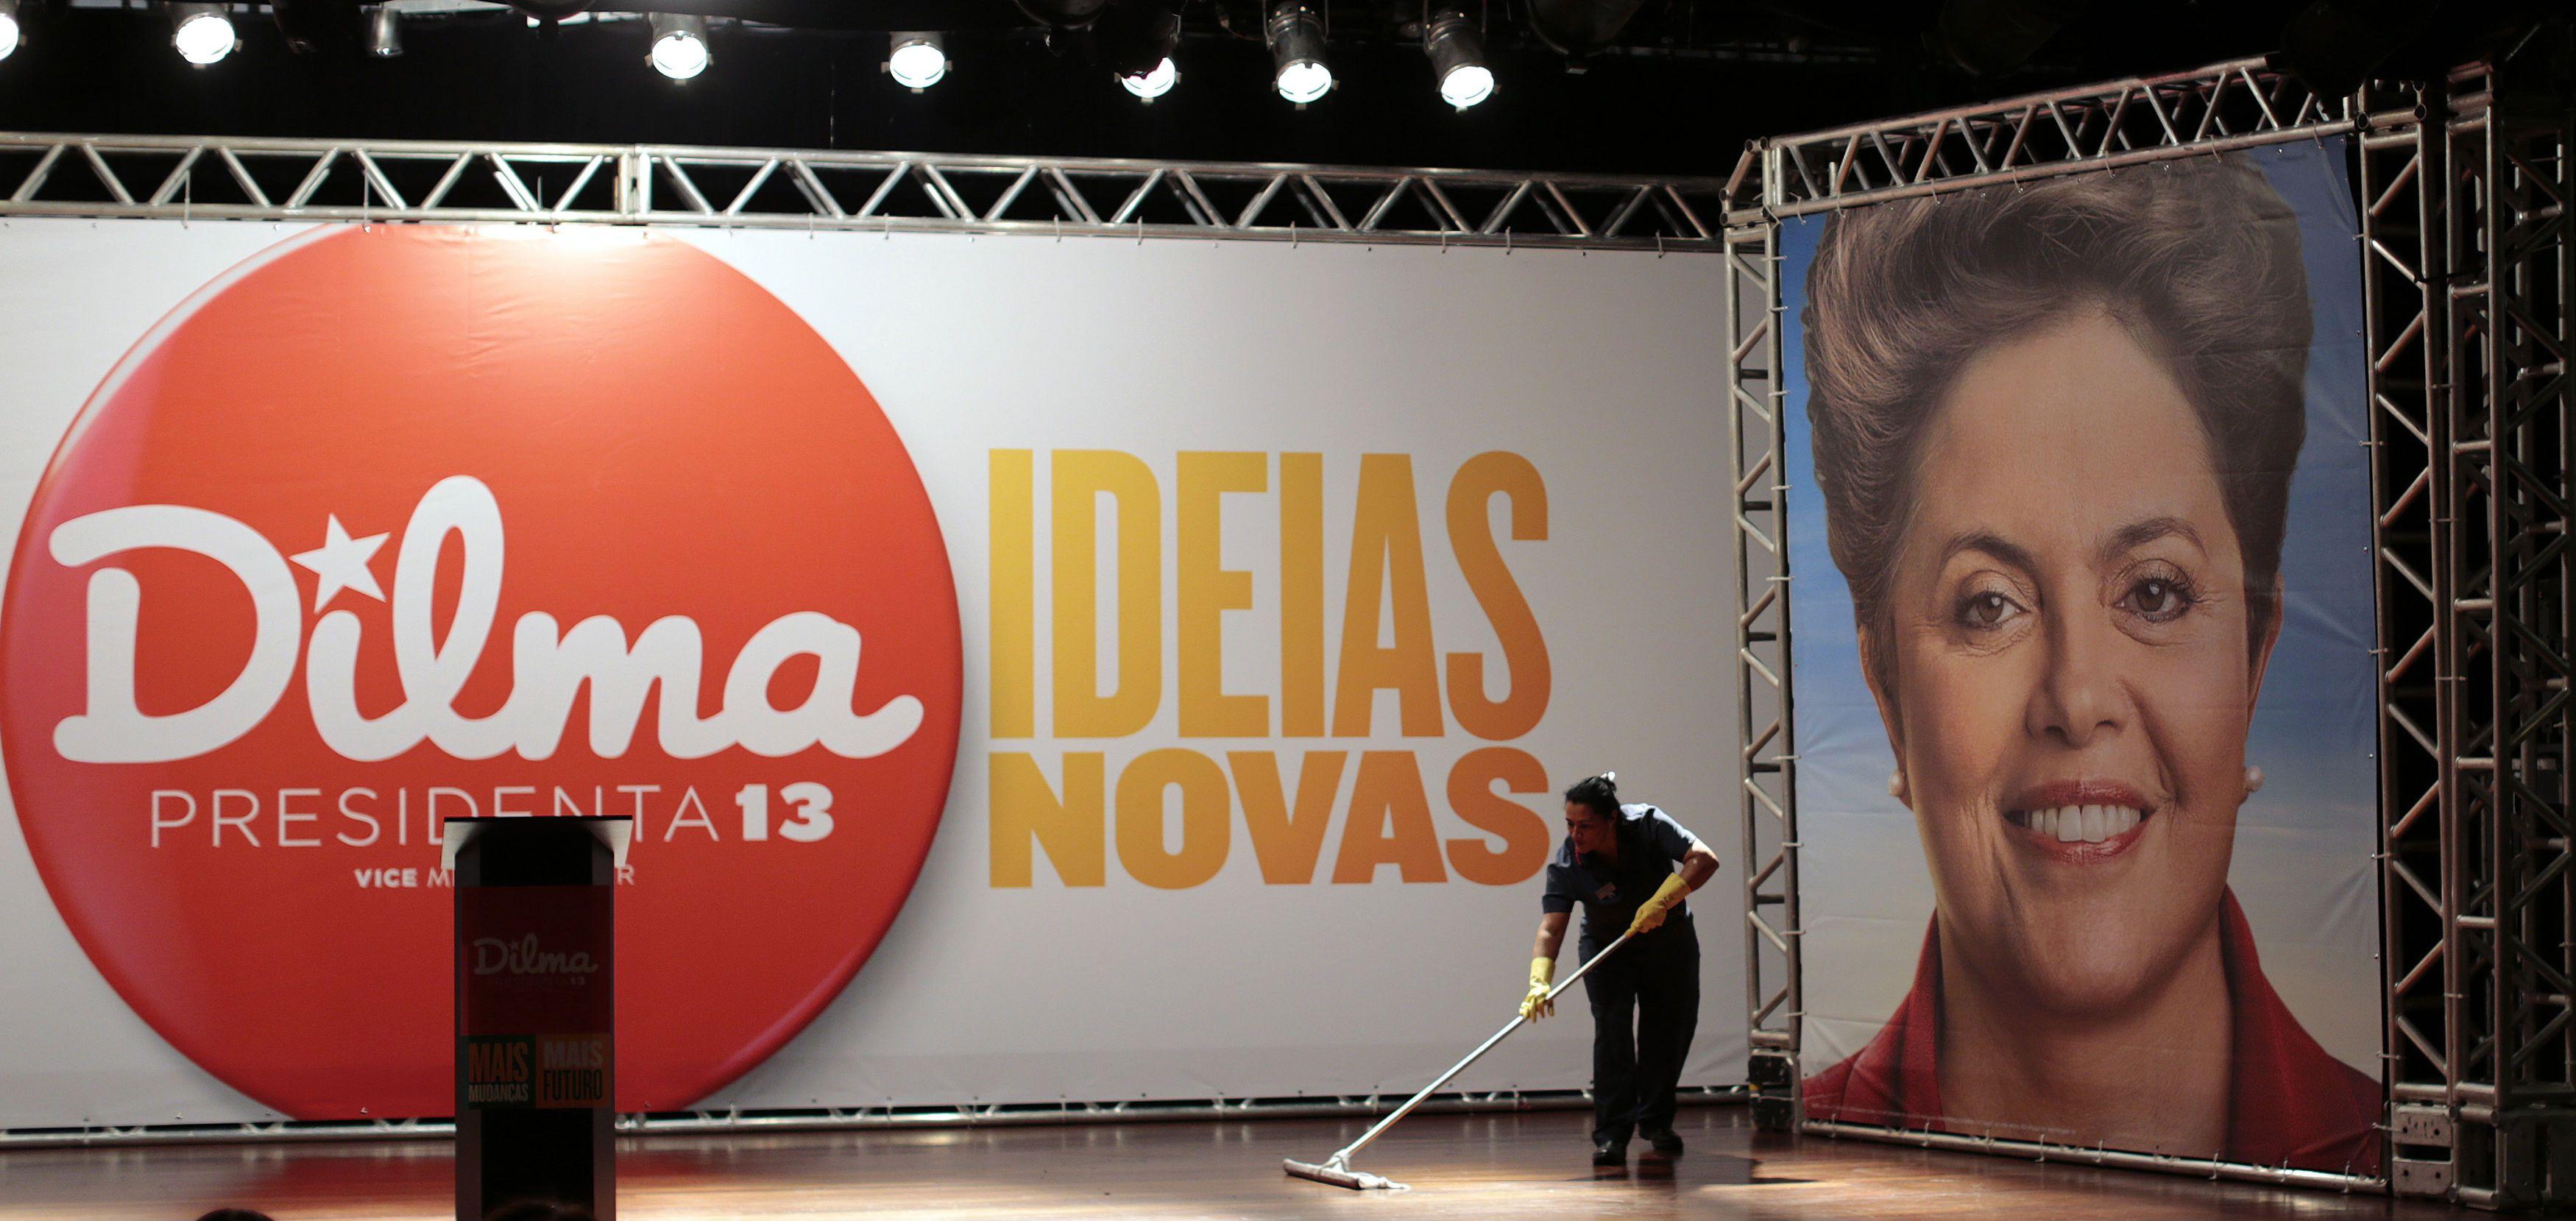 Dilma's campaign